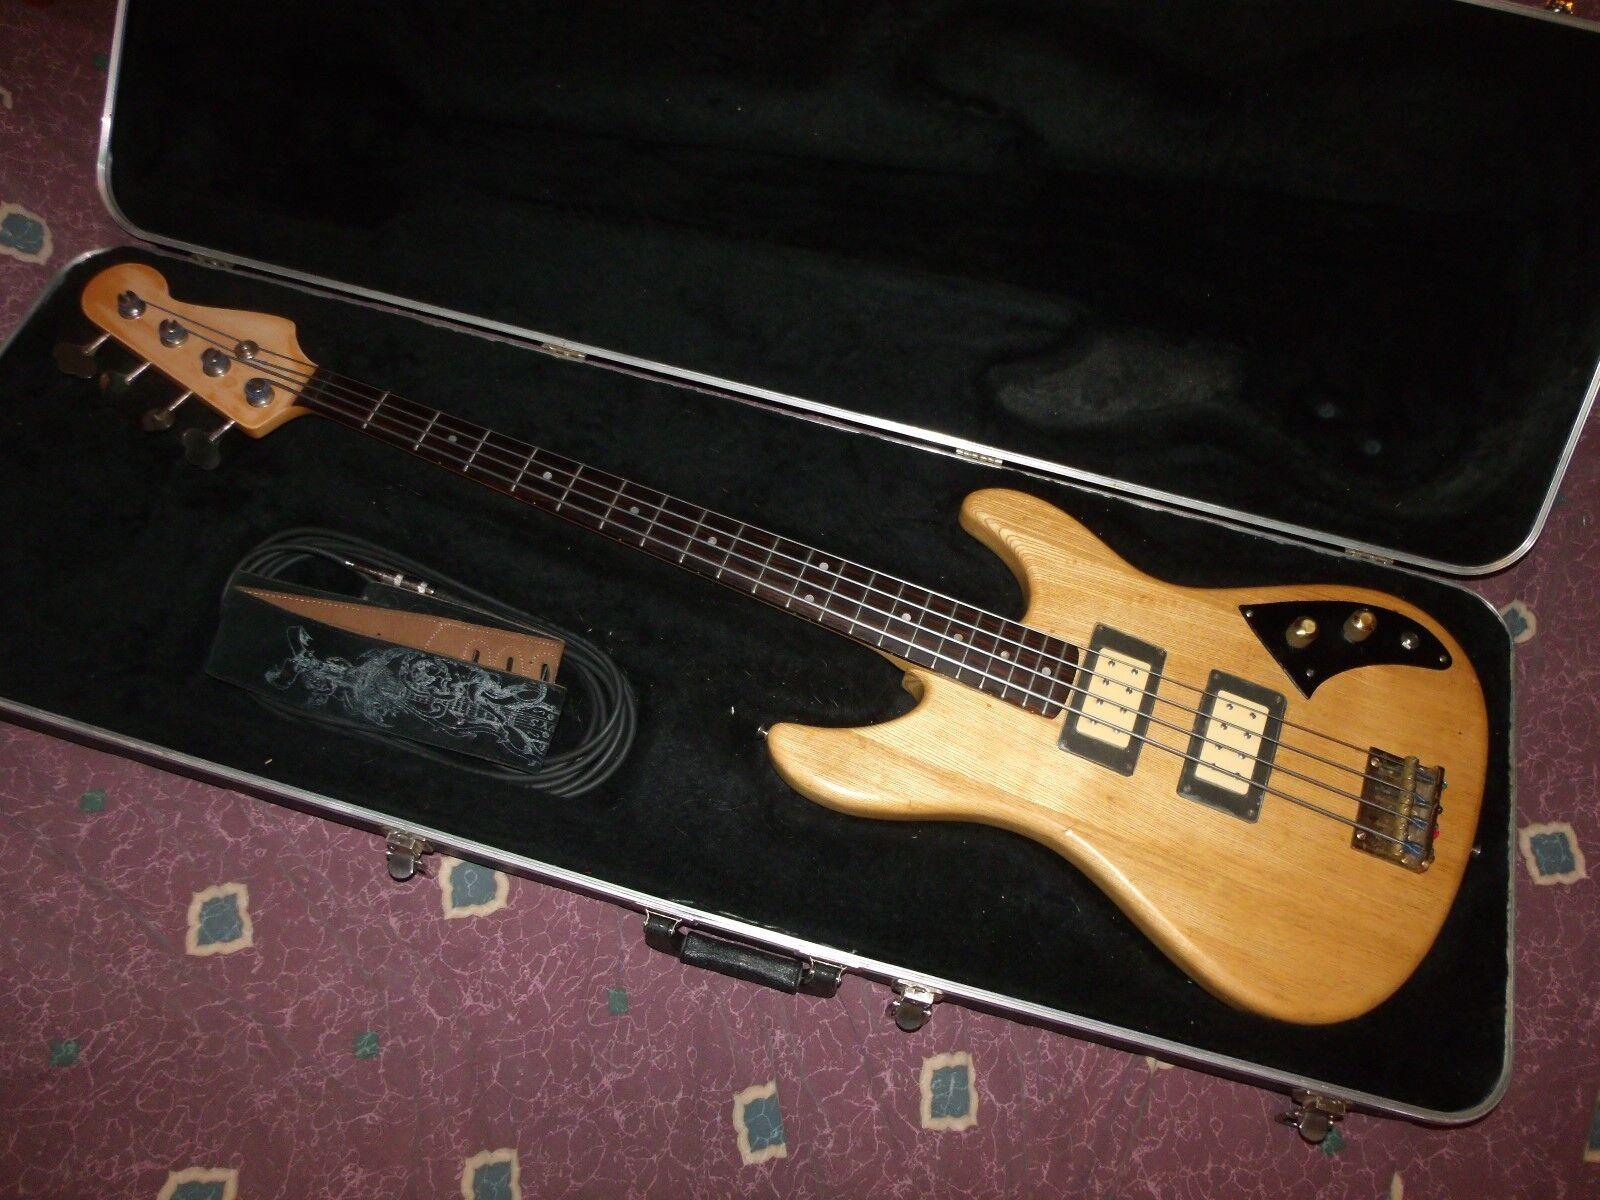 1980 Schecter USA E-Bass S n B0150 Paf Dimarzios Brasilien Platine Rvrse Tuner